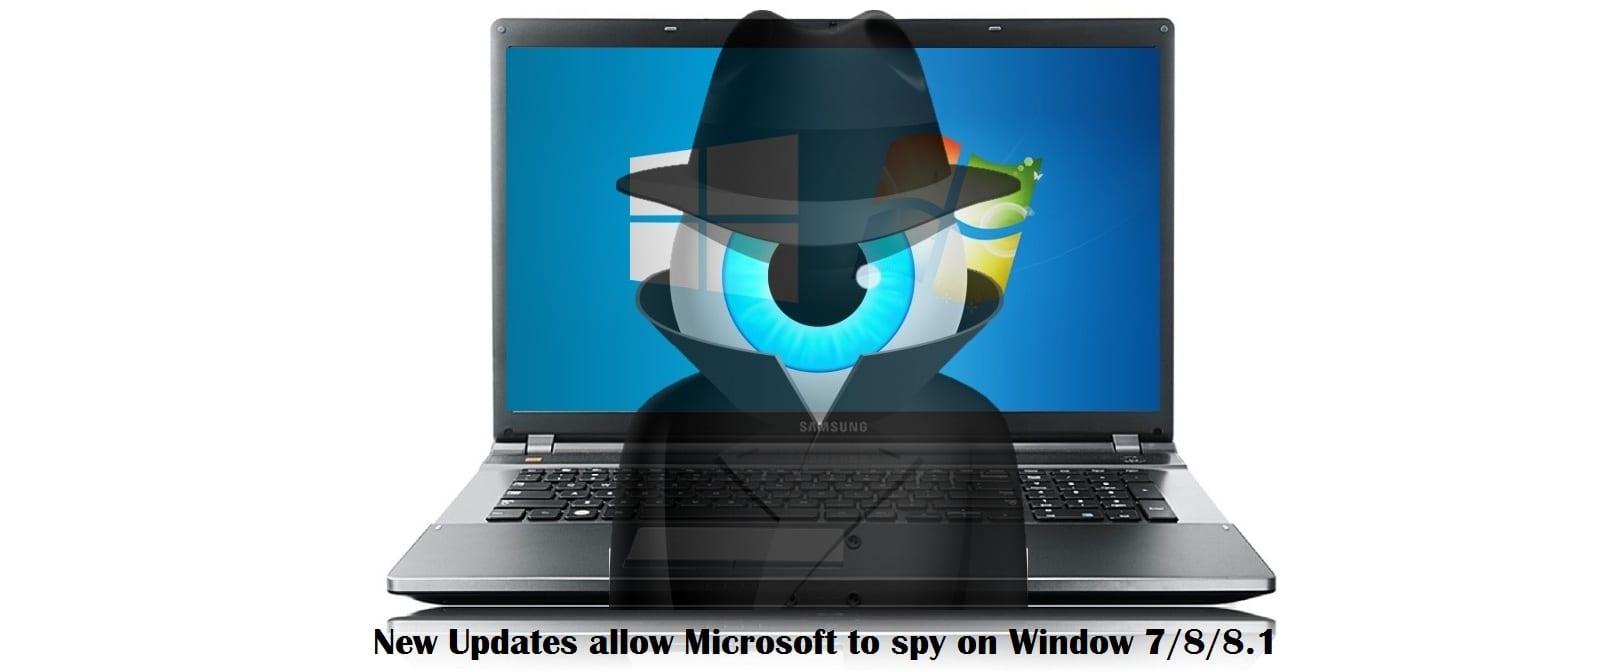 New Windows 7/8/8.1 updates spy on you just like Windows 10